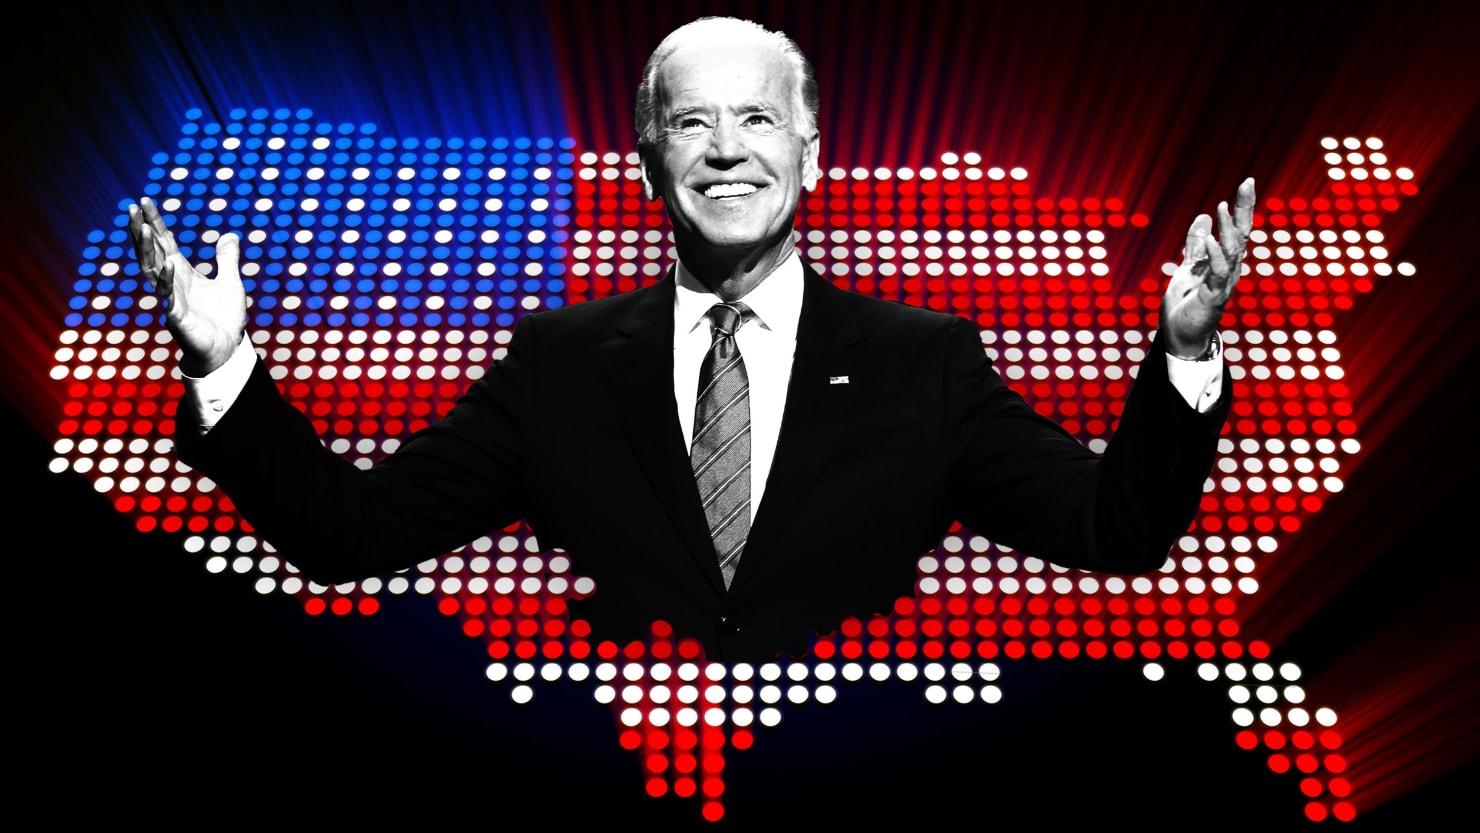 Joe Biden - Integrity and Leadership - cover